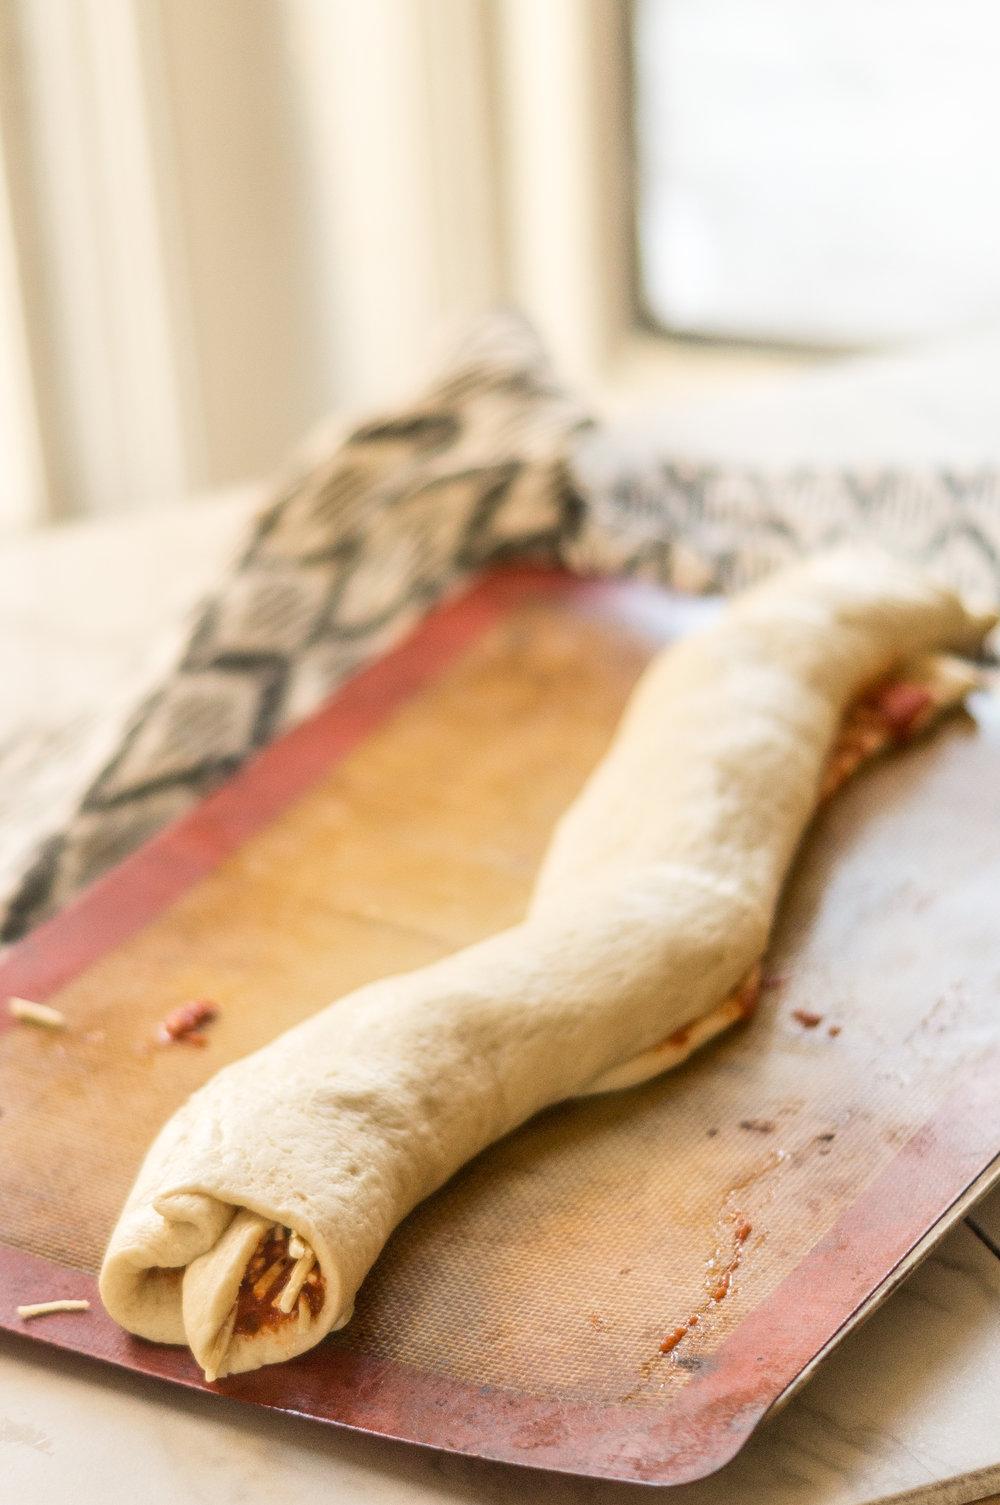 i am rorie, i am rorie recipes, whole foods, vegan food, vegan snacks, vegan sport food, vegan super bowl recipes, super bowl recipes, vegan pizza, pizza, homemade pizza rolls, vegan pizza rolls, pillsbury pizza crust, daiya vegan cheese, daiya vegan mozzarella, mozzarella, vegan mozzarella, tomato sauce, pizza sauce, vegan pizza crust, chicago vegan blog, vegan blogger, vegan recipes, chicago blogger, food blogger, vegan food blogger, delicious vegan food, i am rorie food, vegan comfort food, vegan party food, party food recipe, vegan party food recipe, vegan party recipe